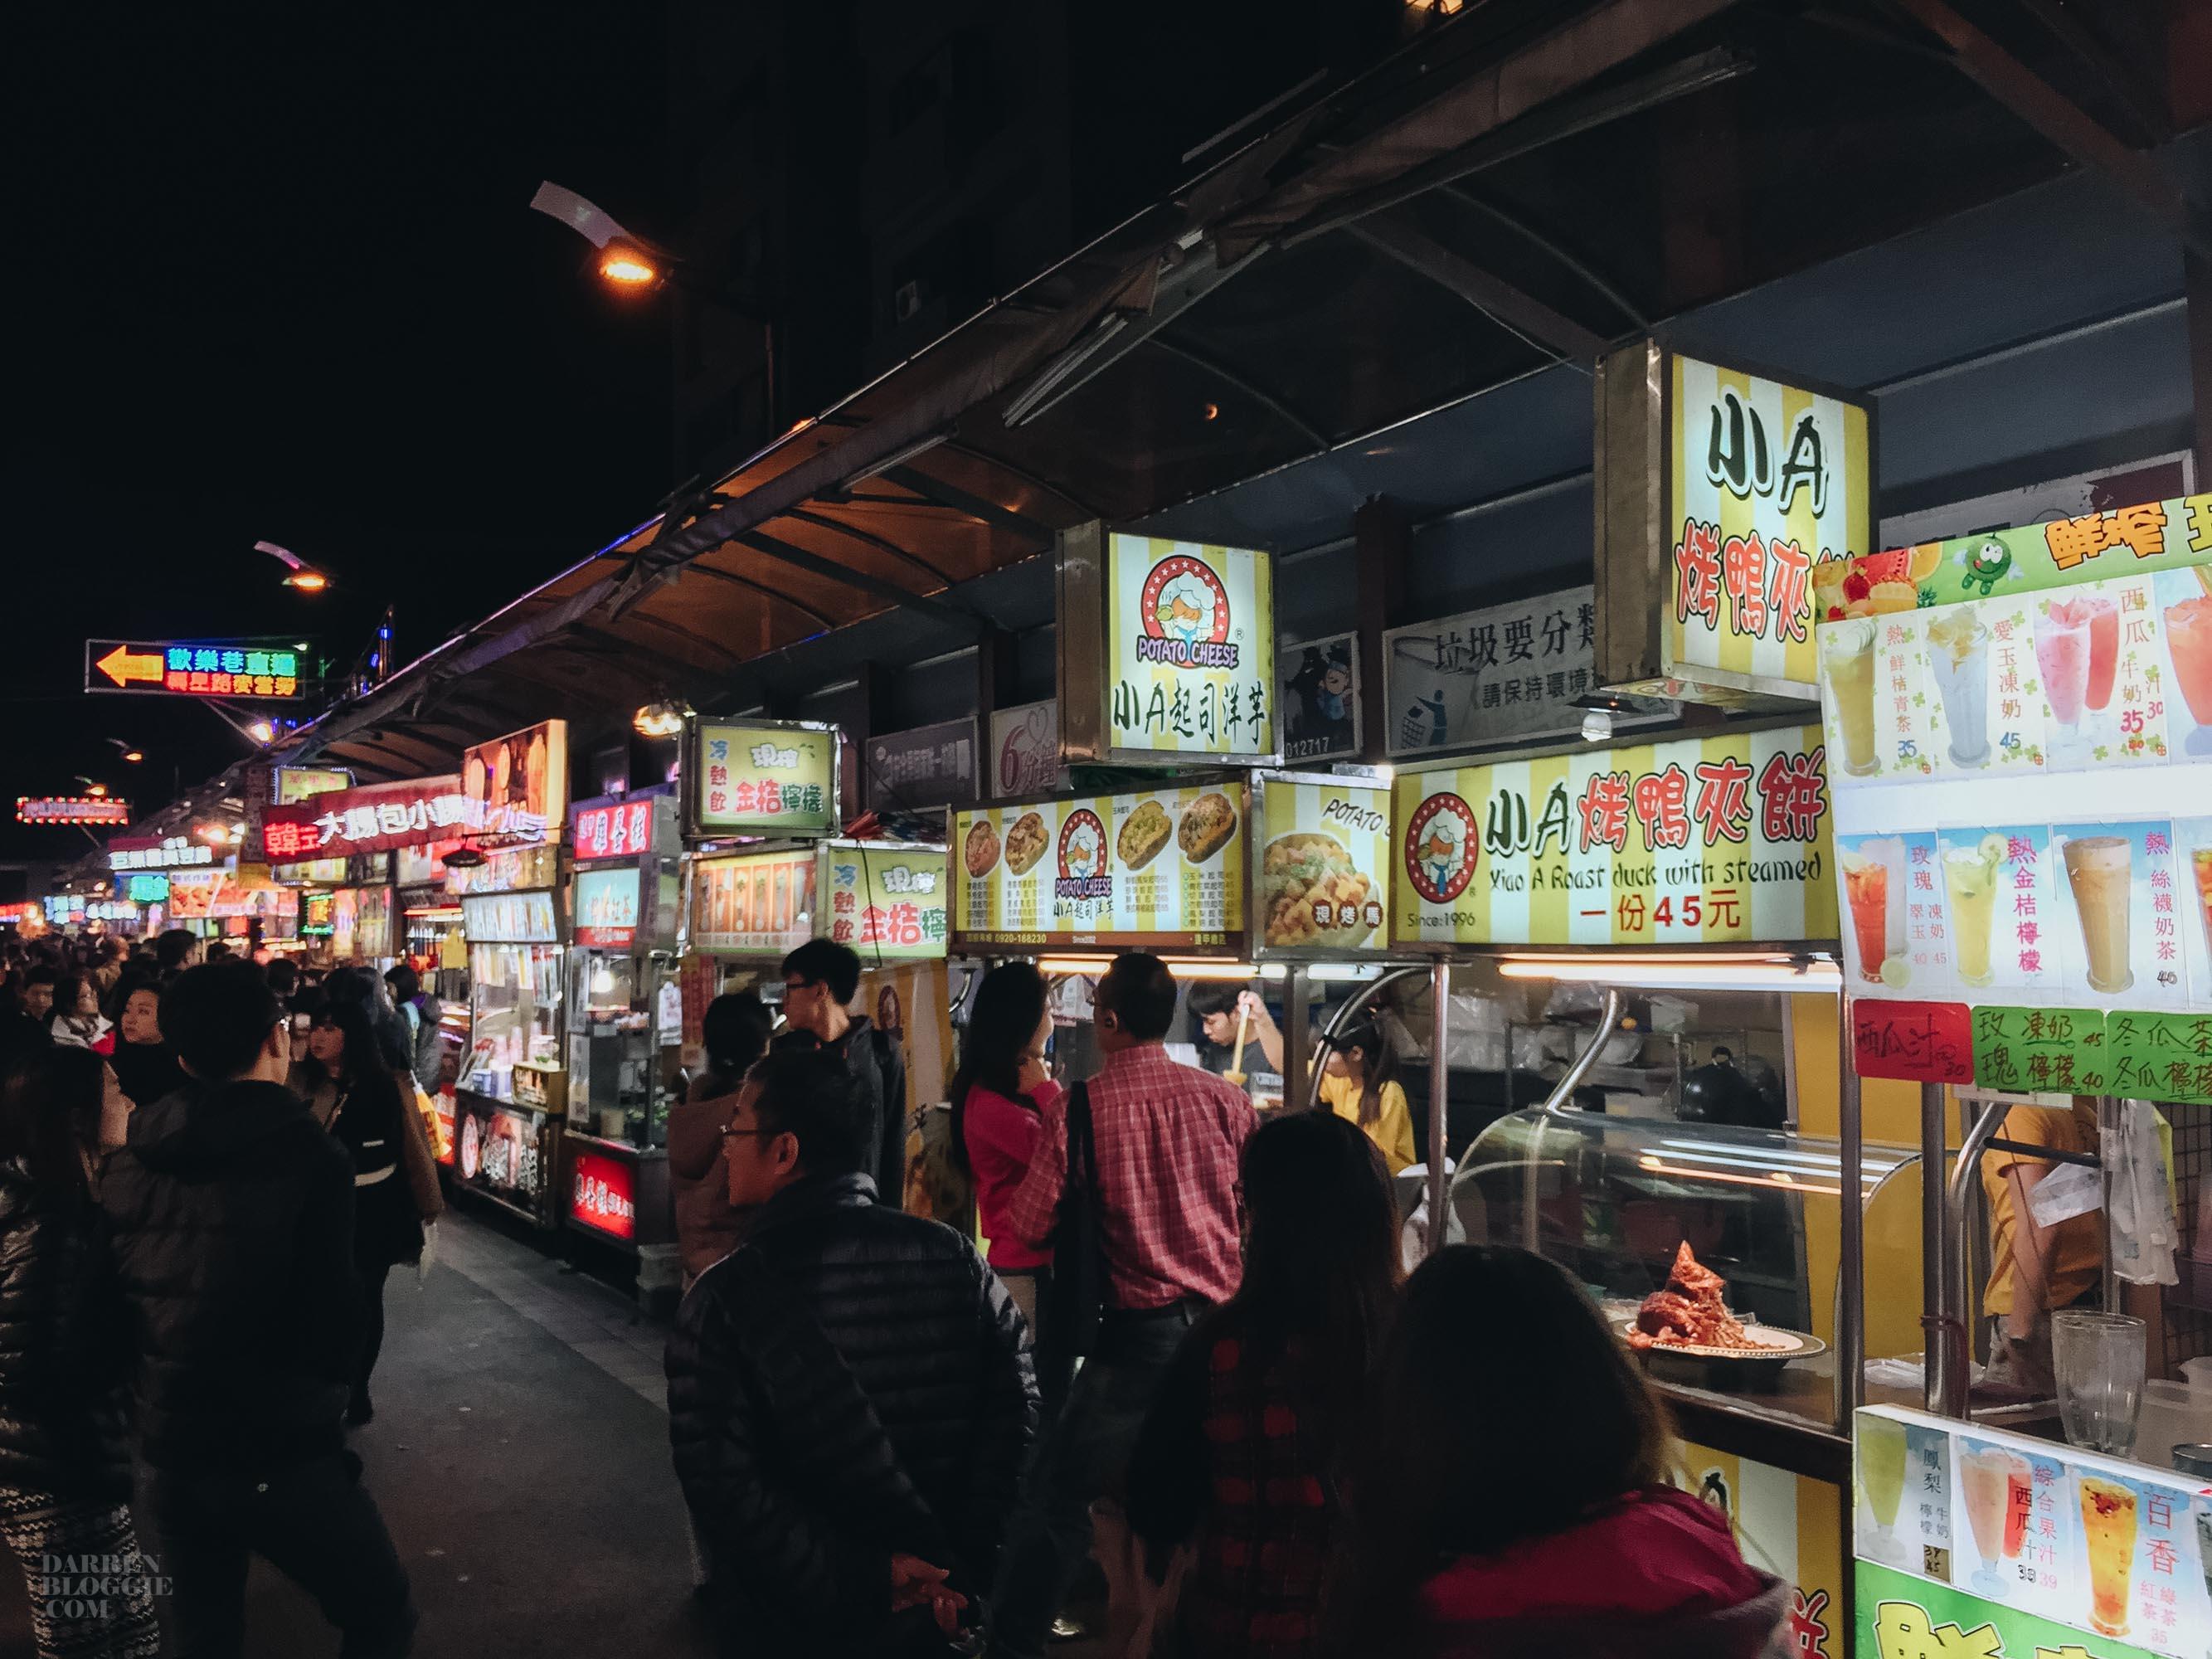 fengjia night market taichung taiwan darrenbloggie